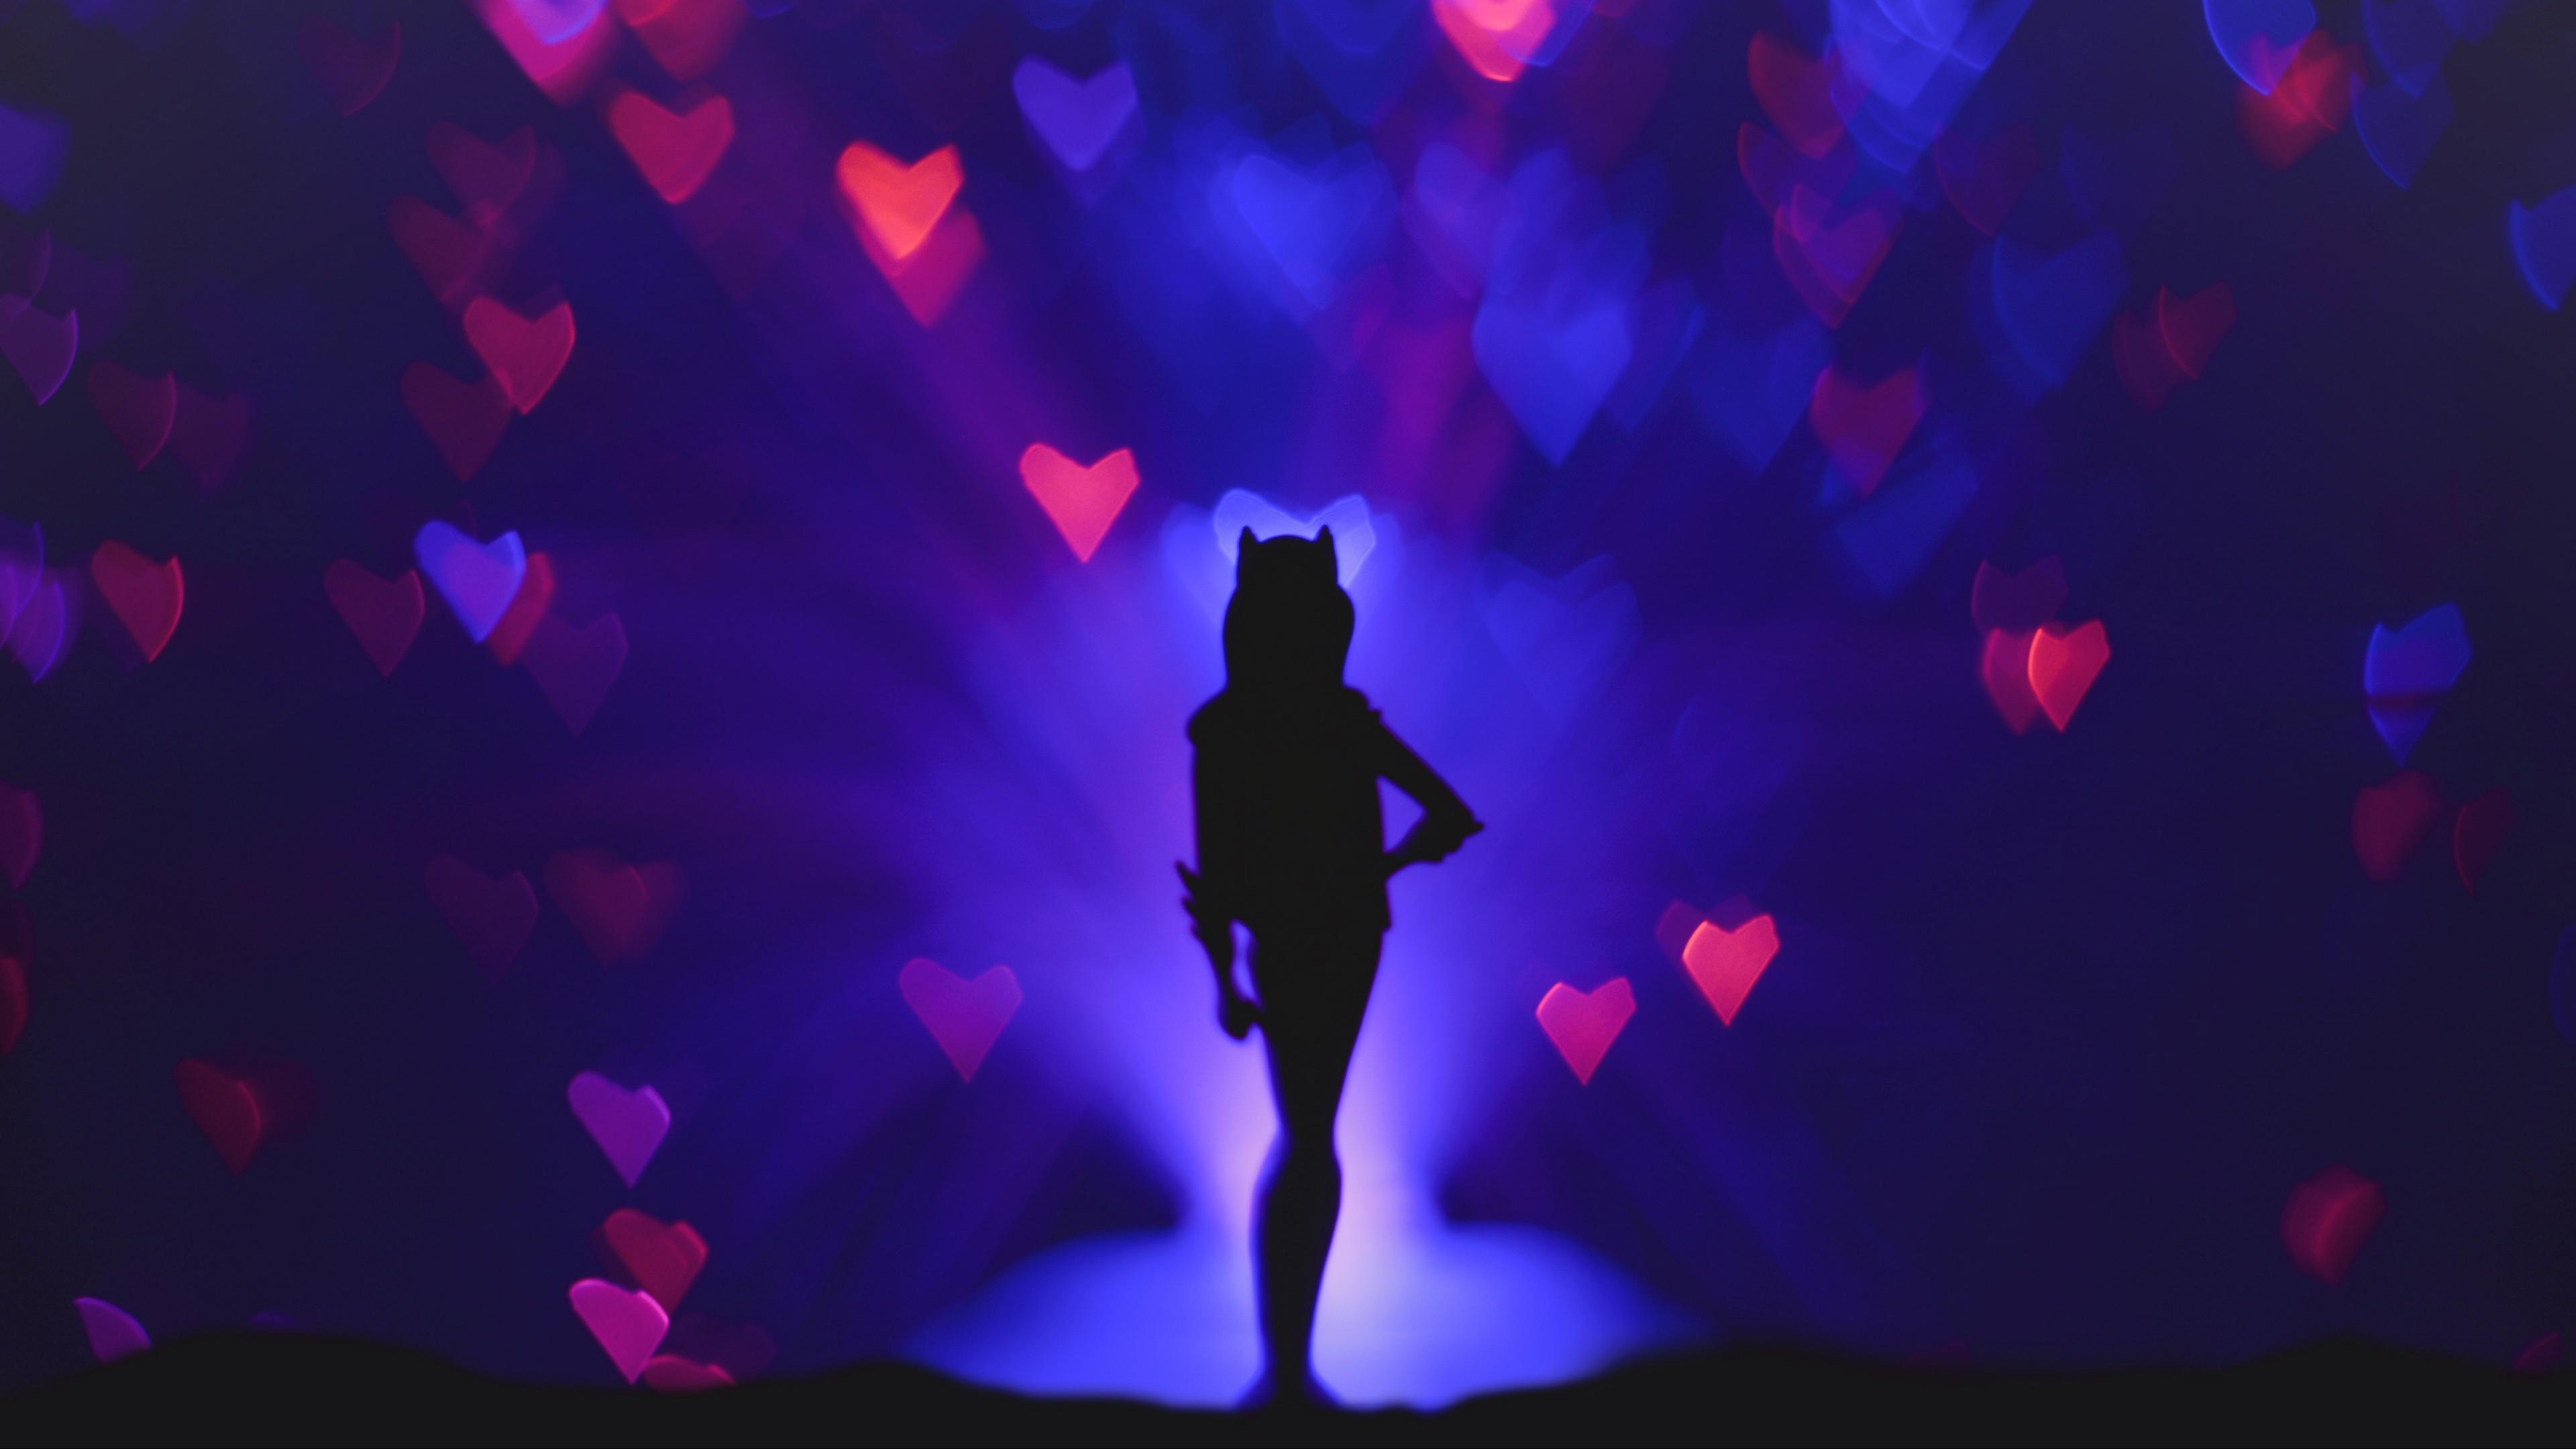 silhouette glare bokeh heart 4k 1540576176 - silhouette, glare, bokeh, heart 4k - Silhouette, glare, Bokeh